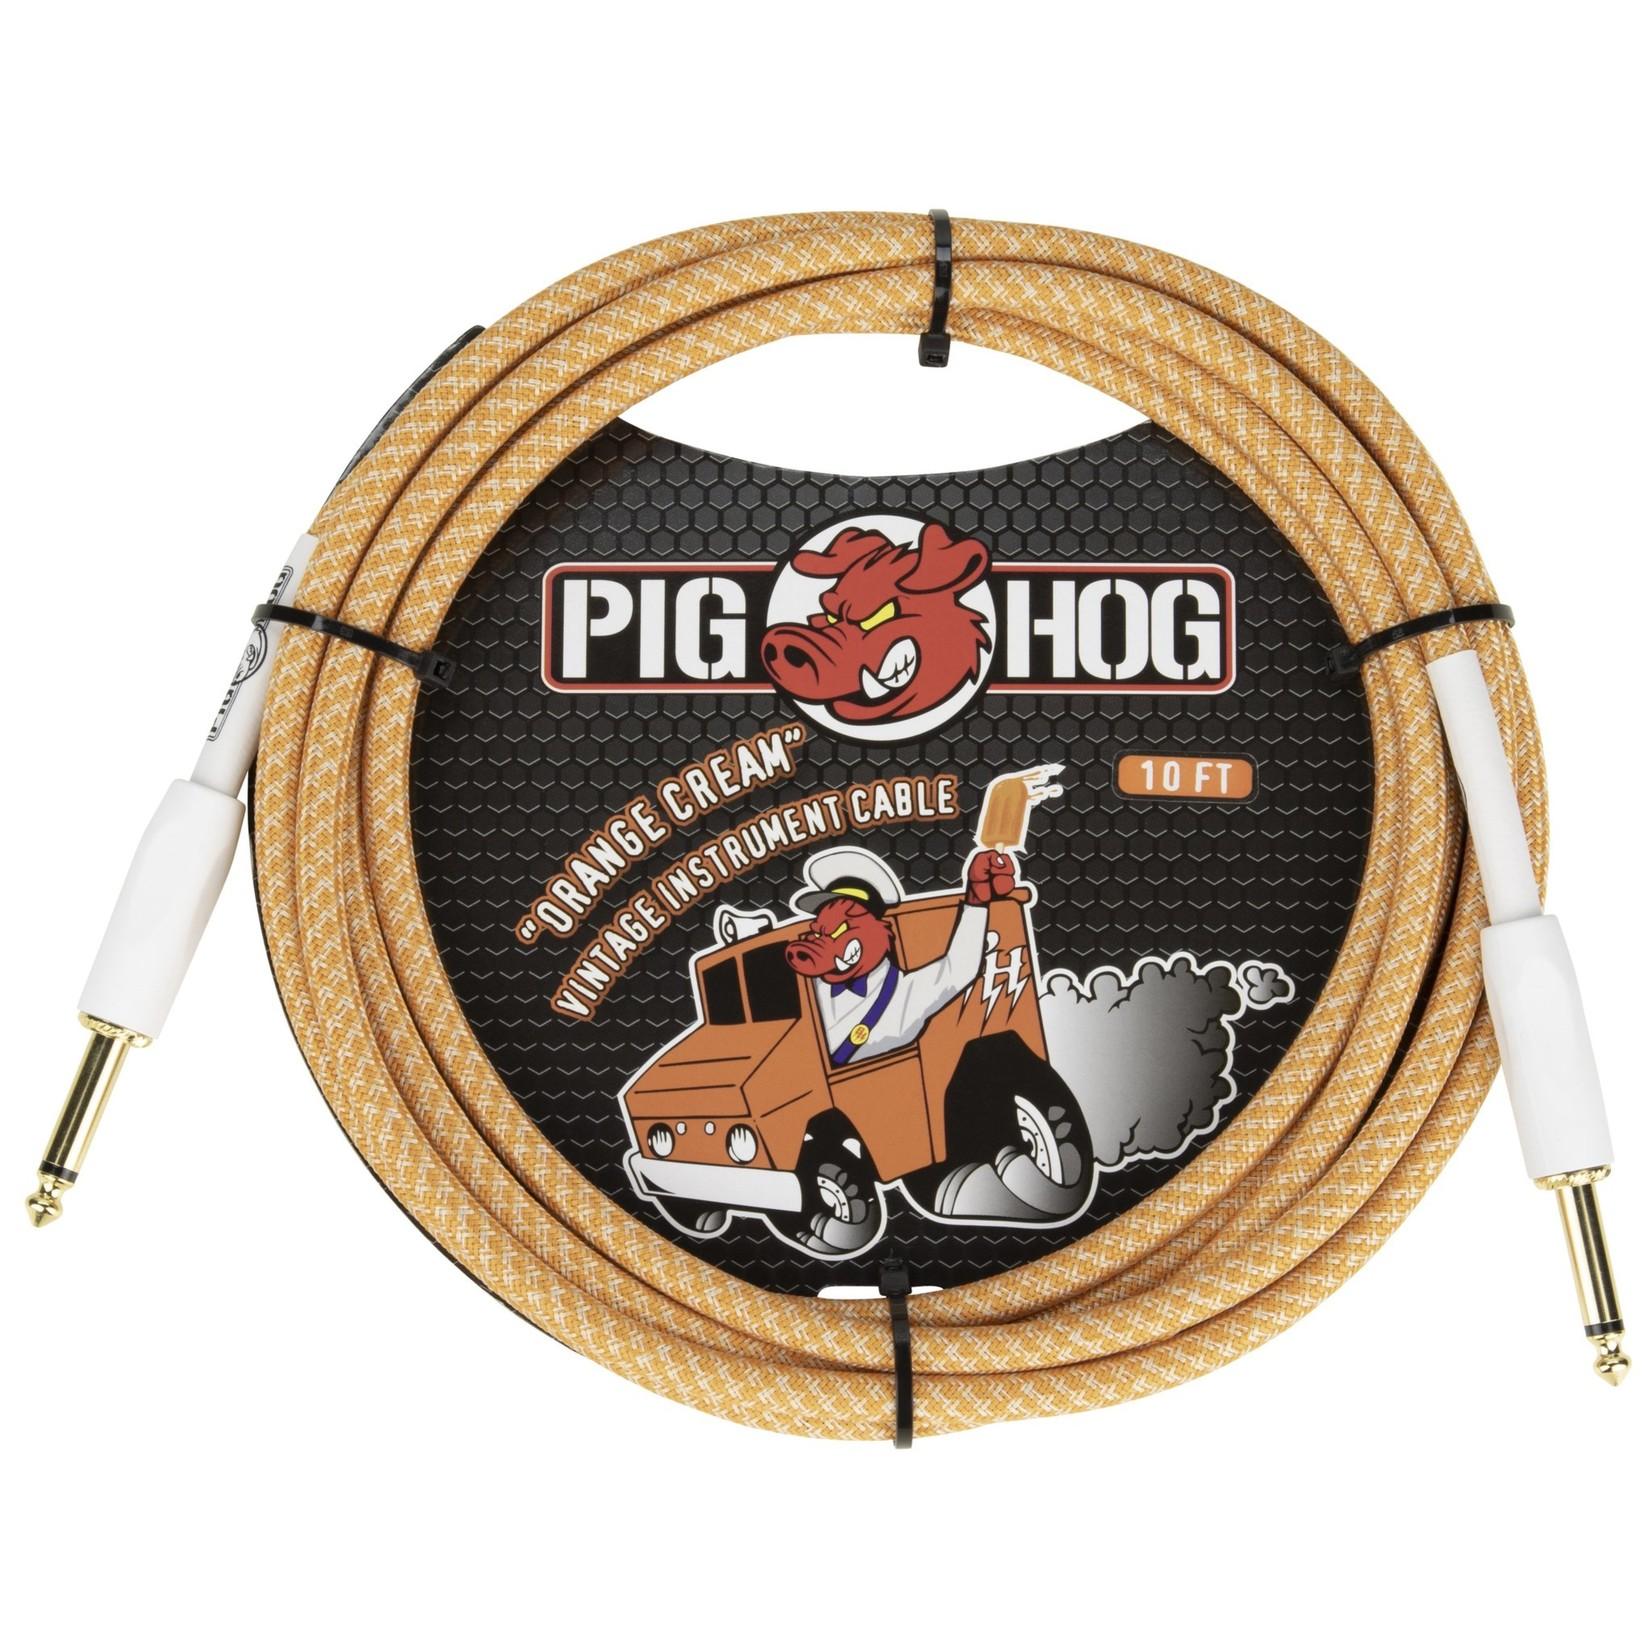 "Pig Hog Pig Hog Tour Grade Vintage Woven 10-Foot Instrument Cable, Straight 1/4"" TS, Orange Cream 2.0 (2020)"